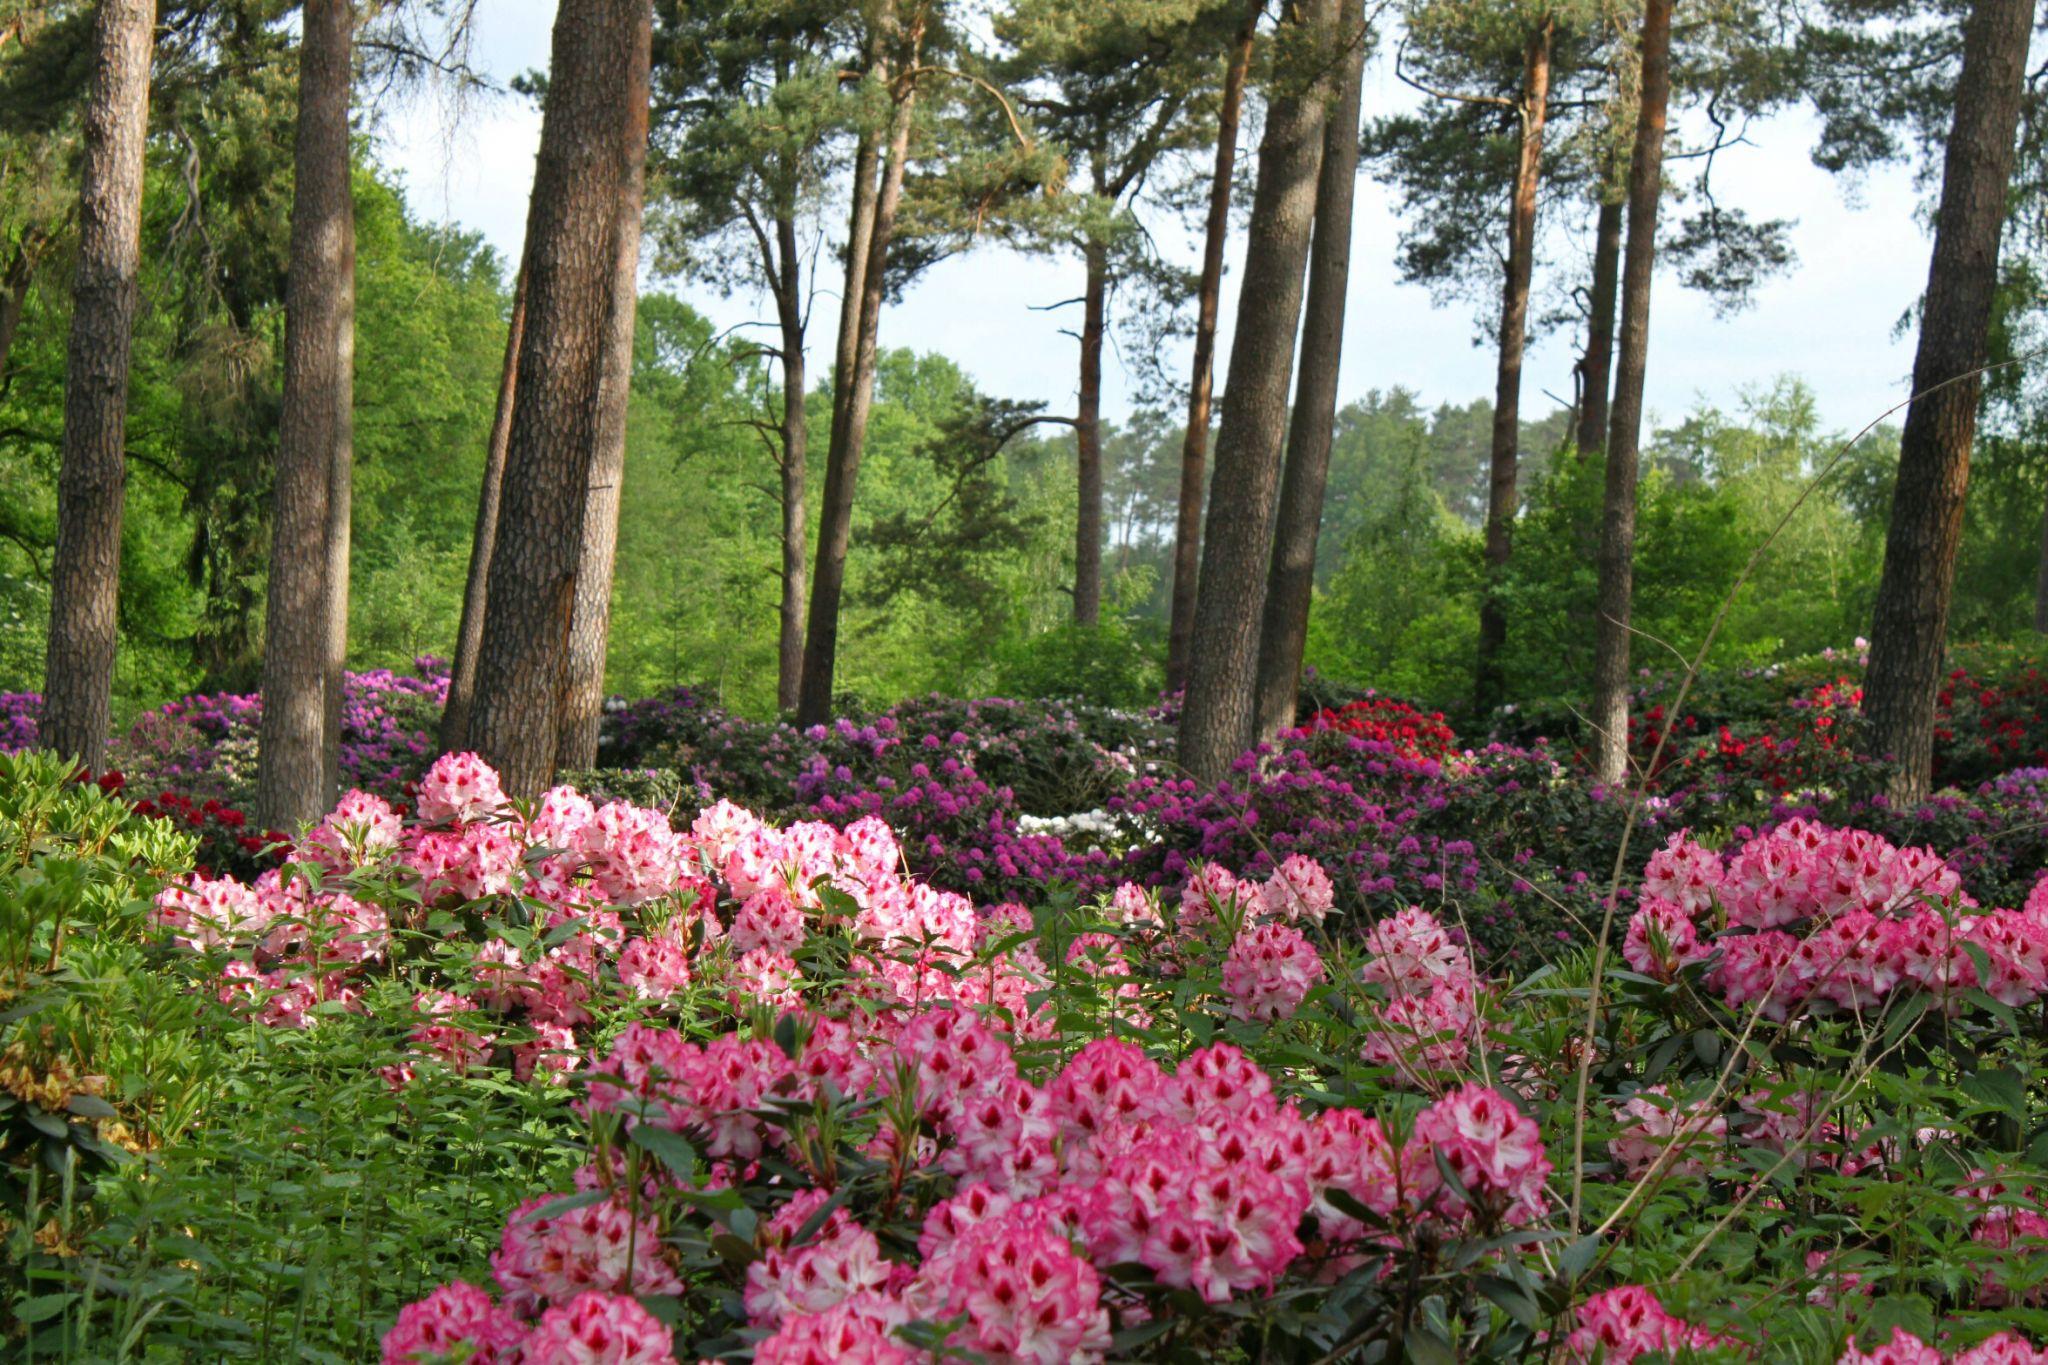 Rhododendronwald, Dülmen, Germany